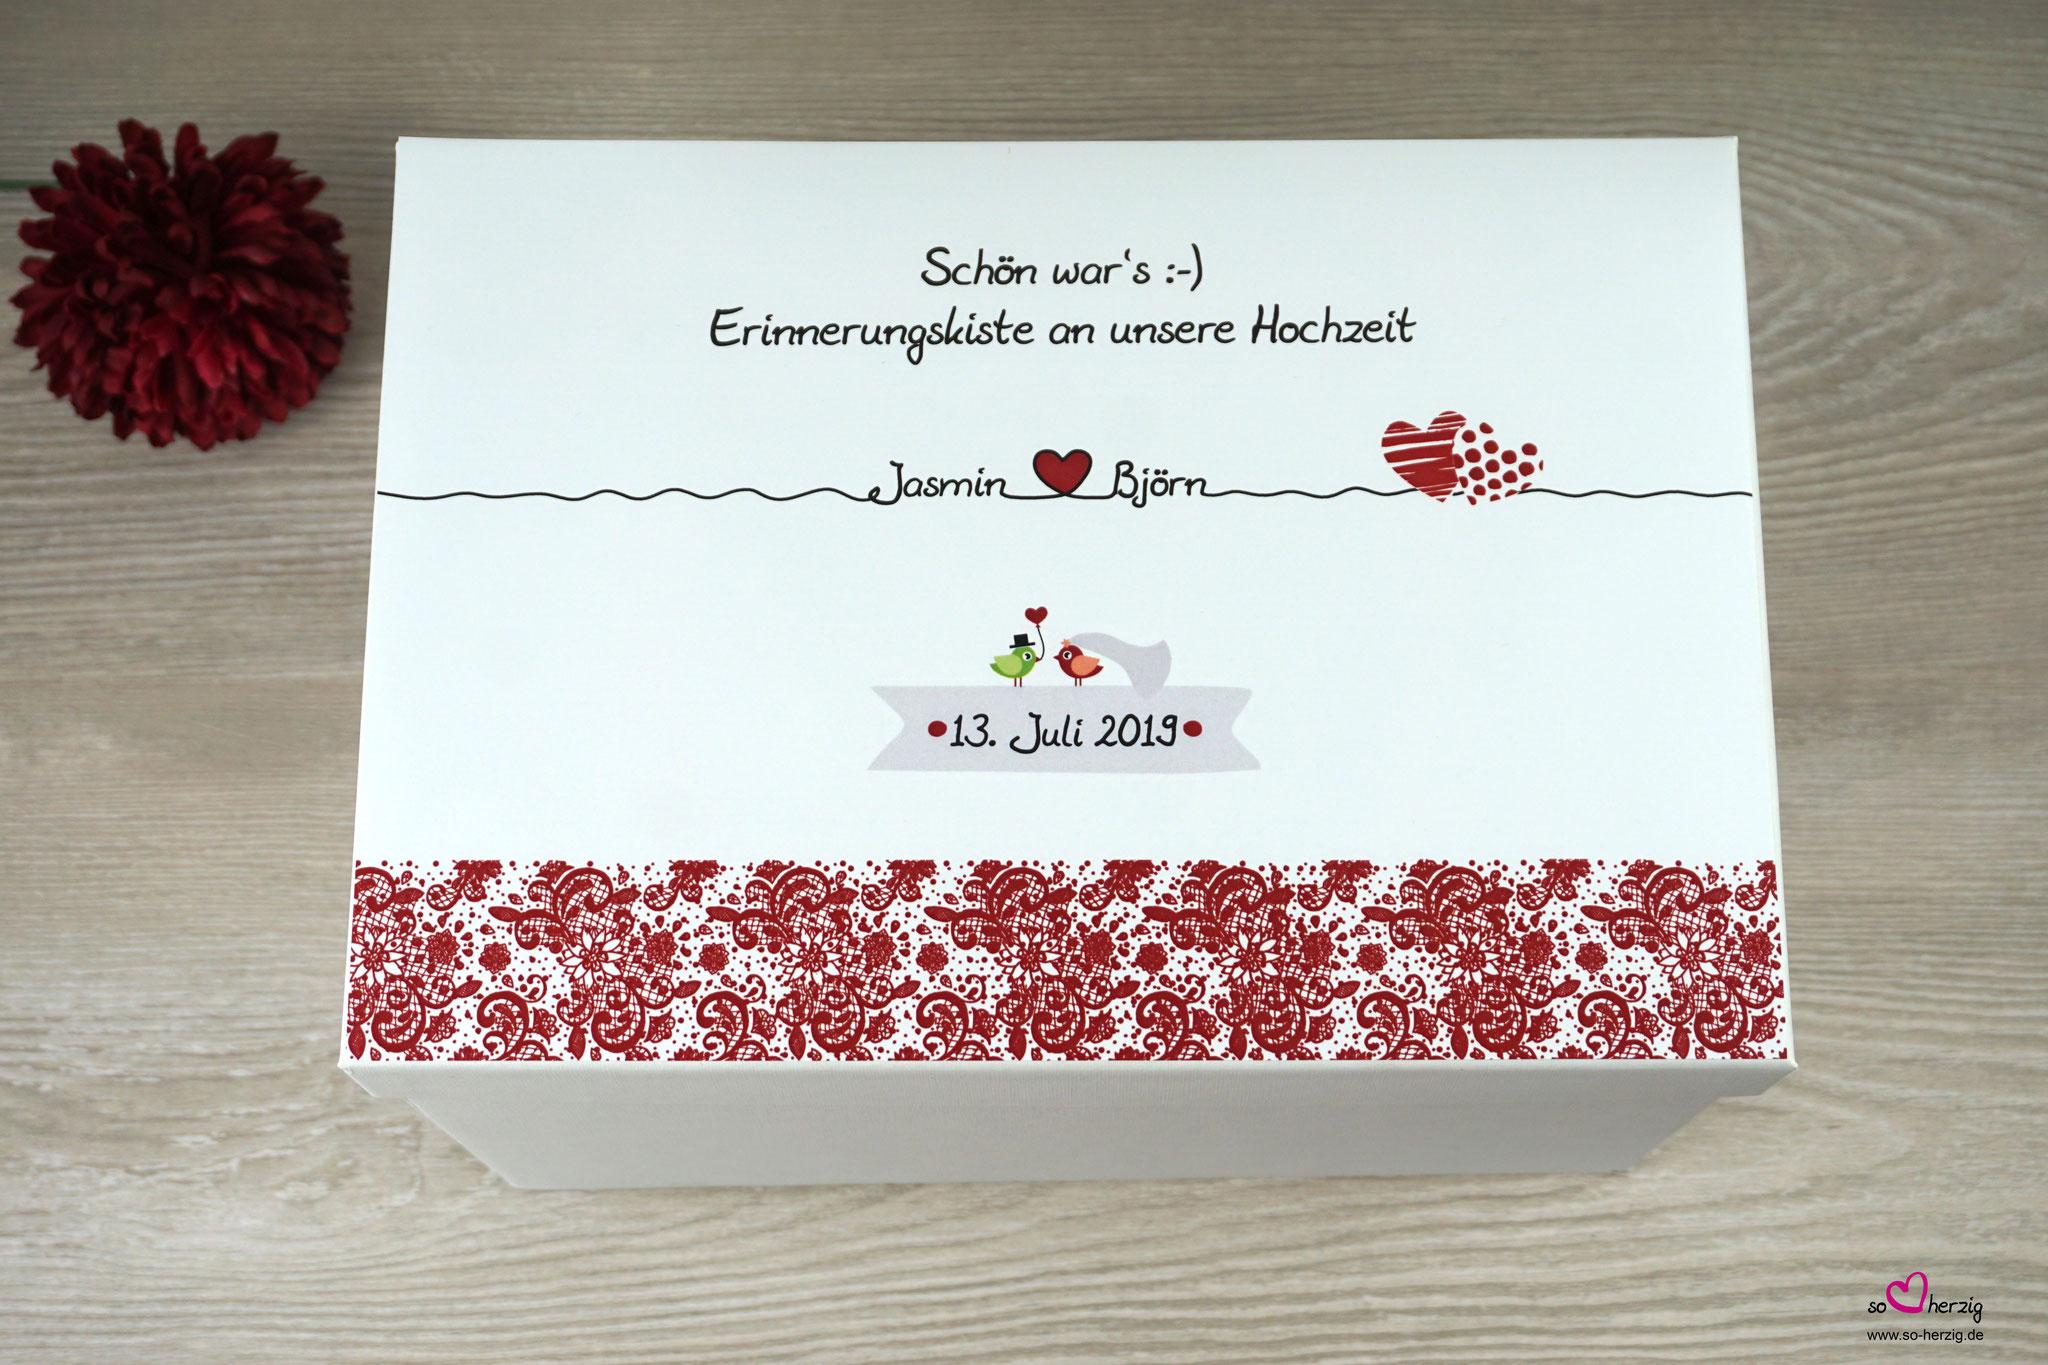 "Erinnerungskiste Design Spitze Dunkelrot - Sonderanfertigung ""Zwei Herzen"""